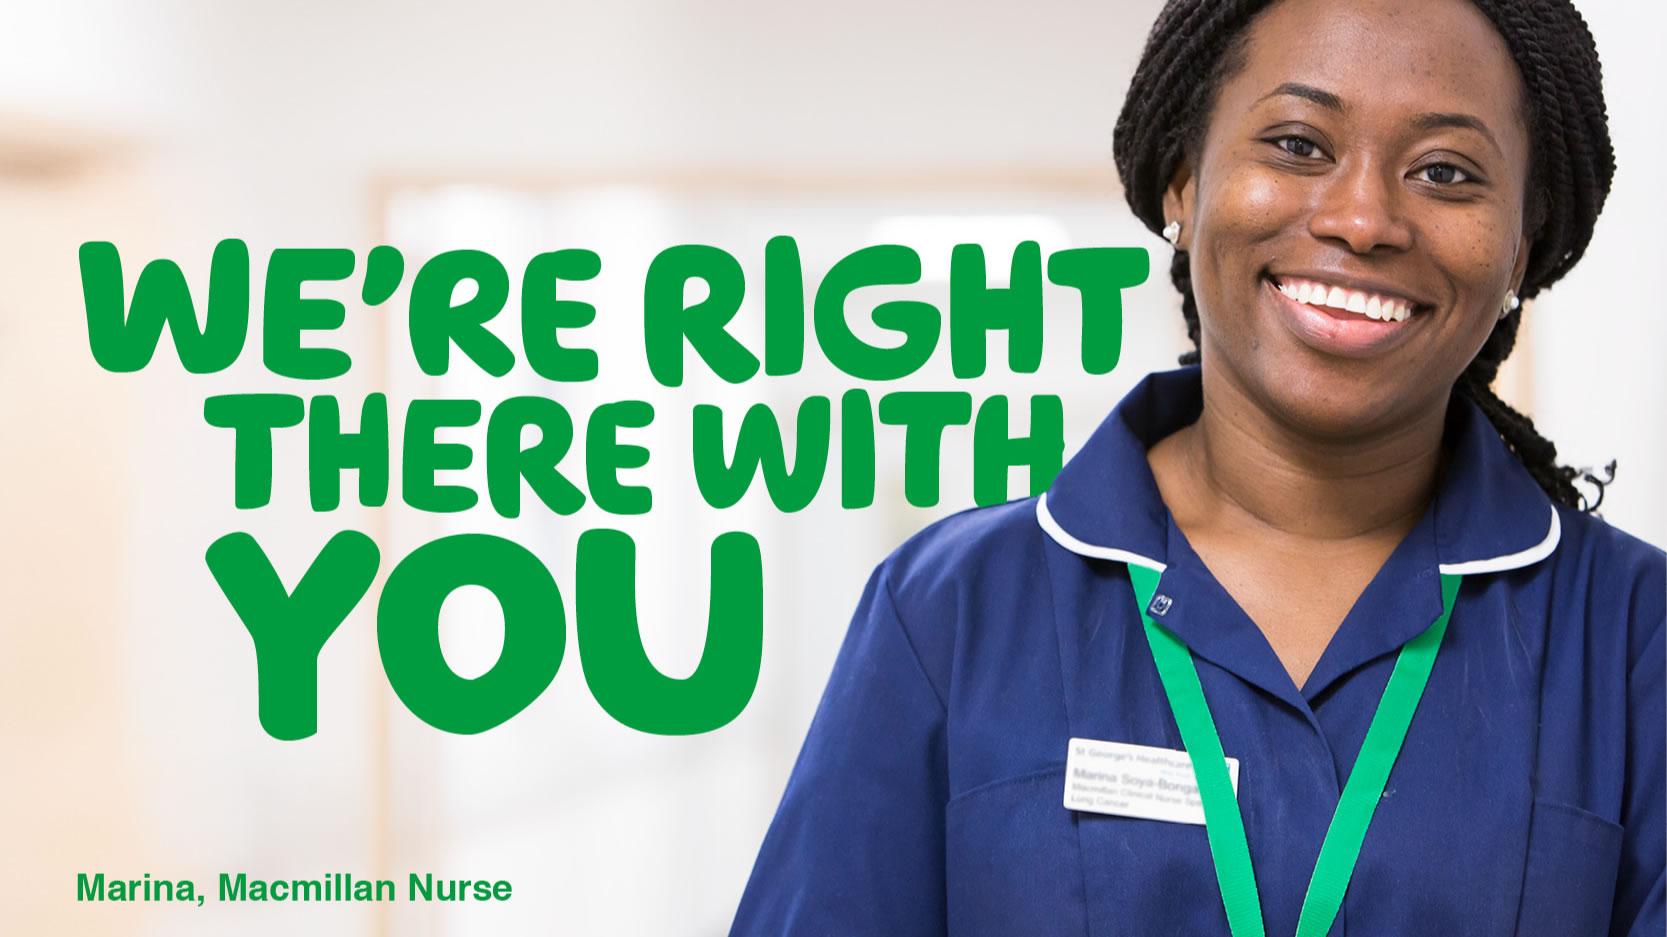 Macmillan Cancer Support Charity - Nurse